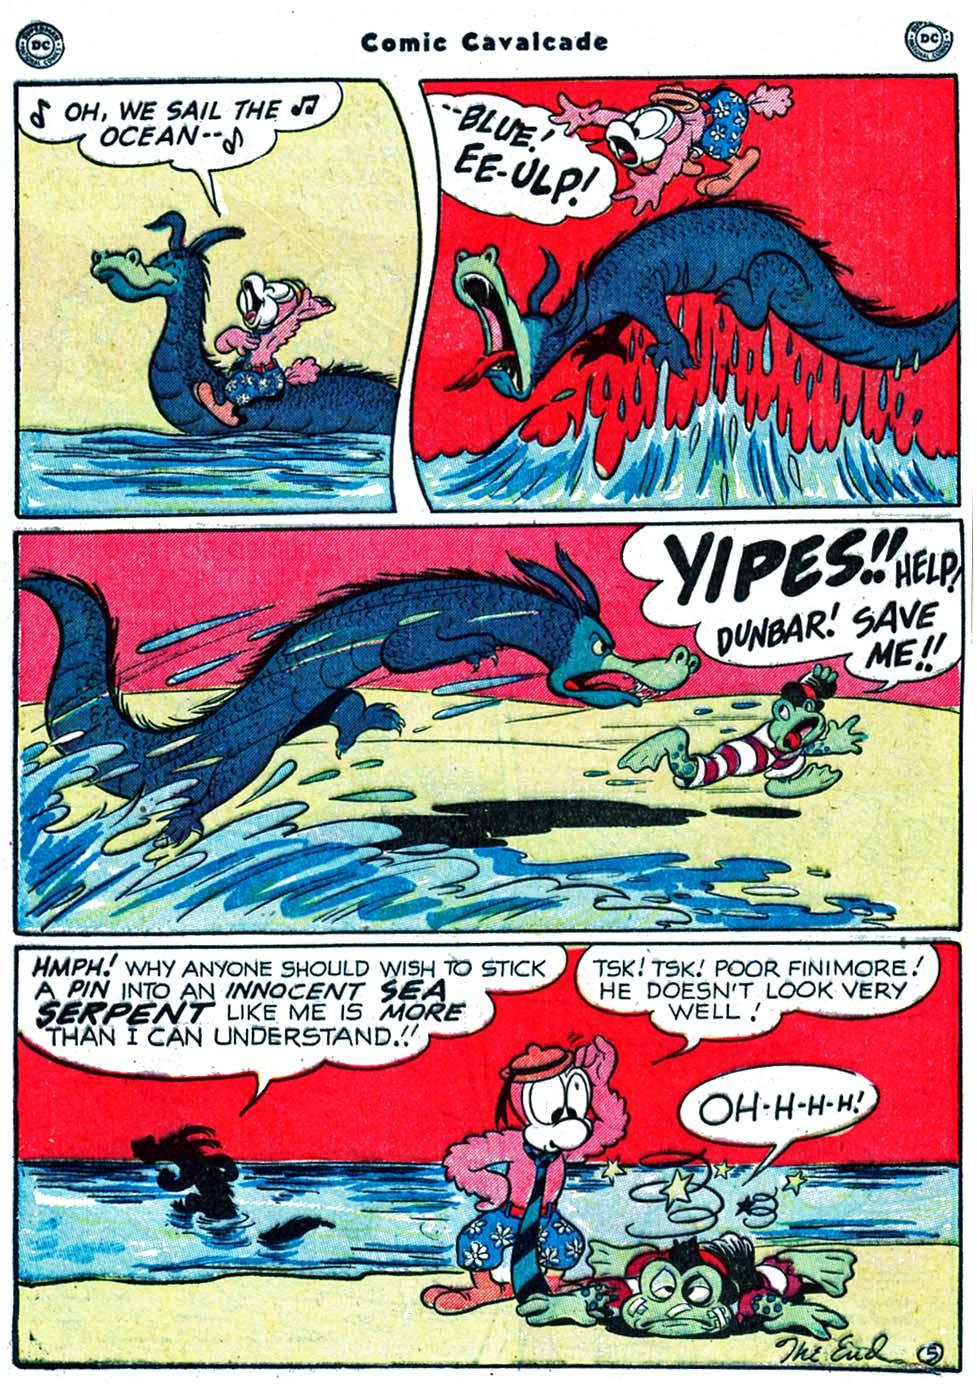 Comic Cavalcade issue 39 - Page 40